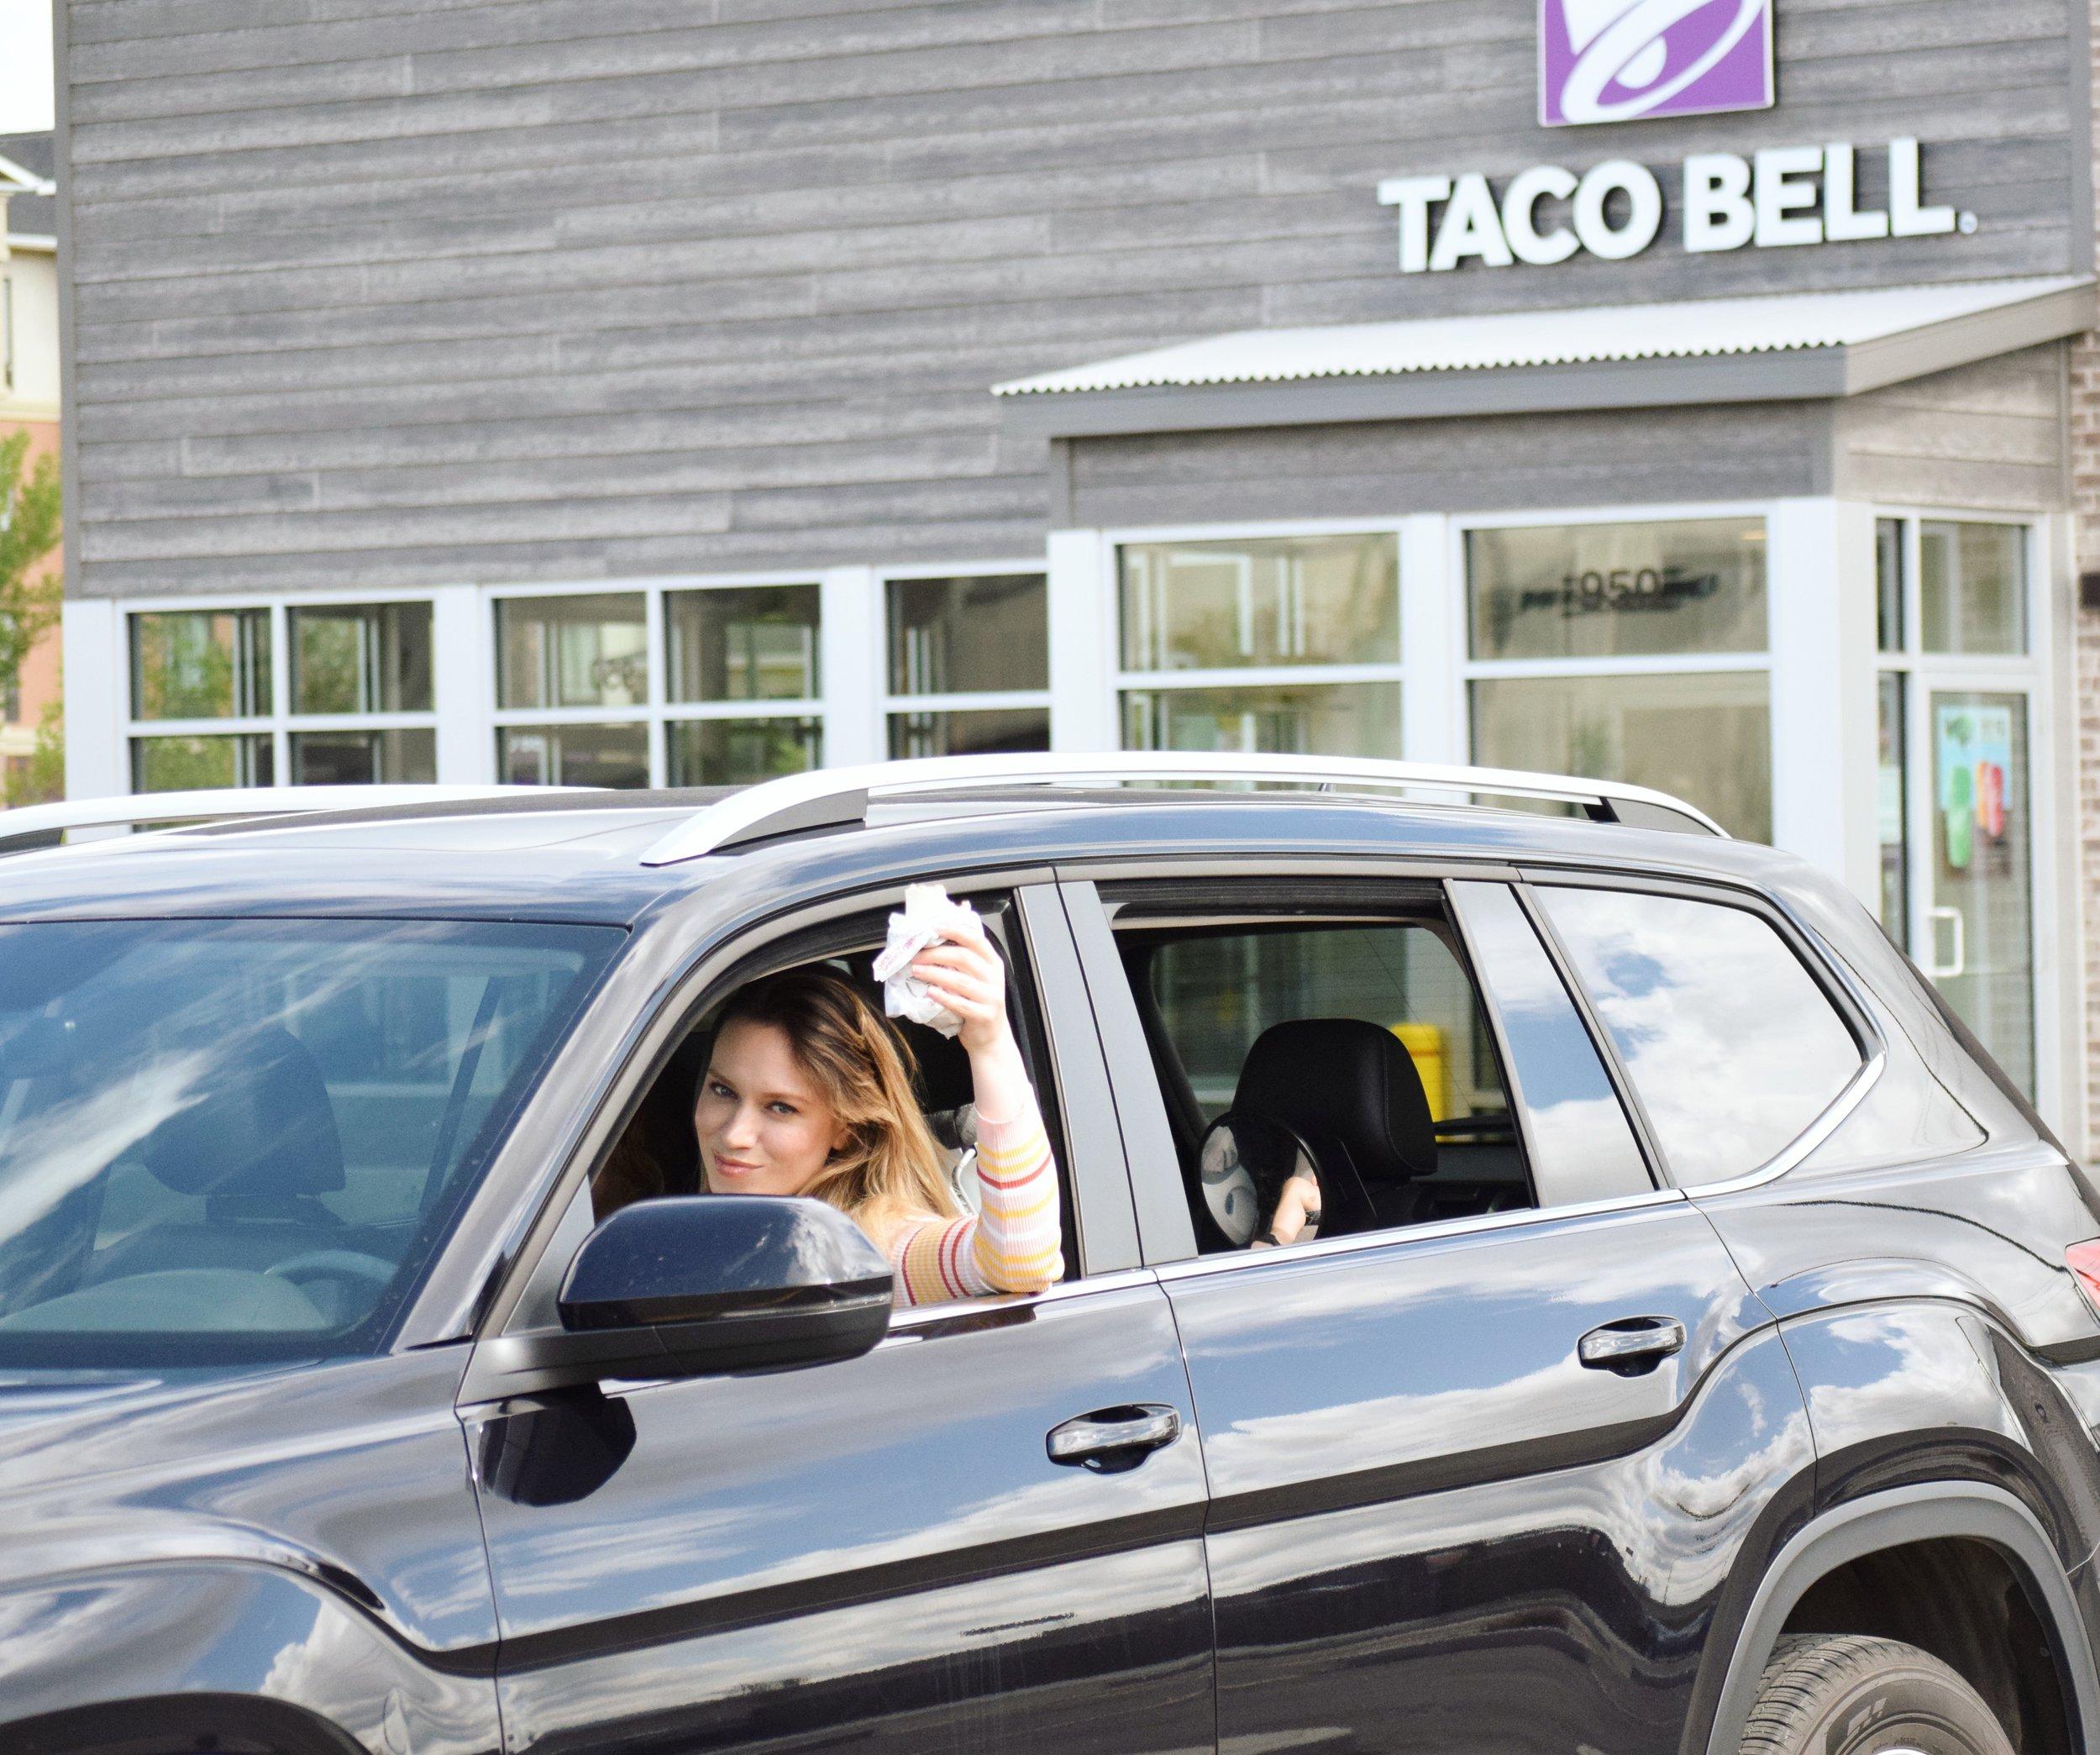 saskatoon mom blogger maygen kardash does me time at taco bell.jpg